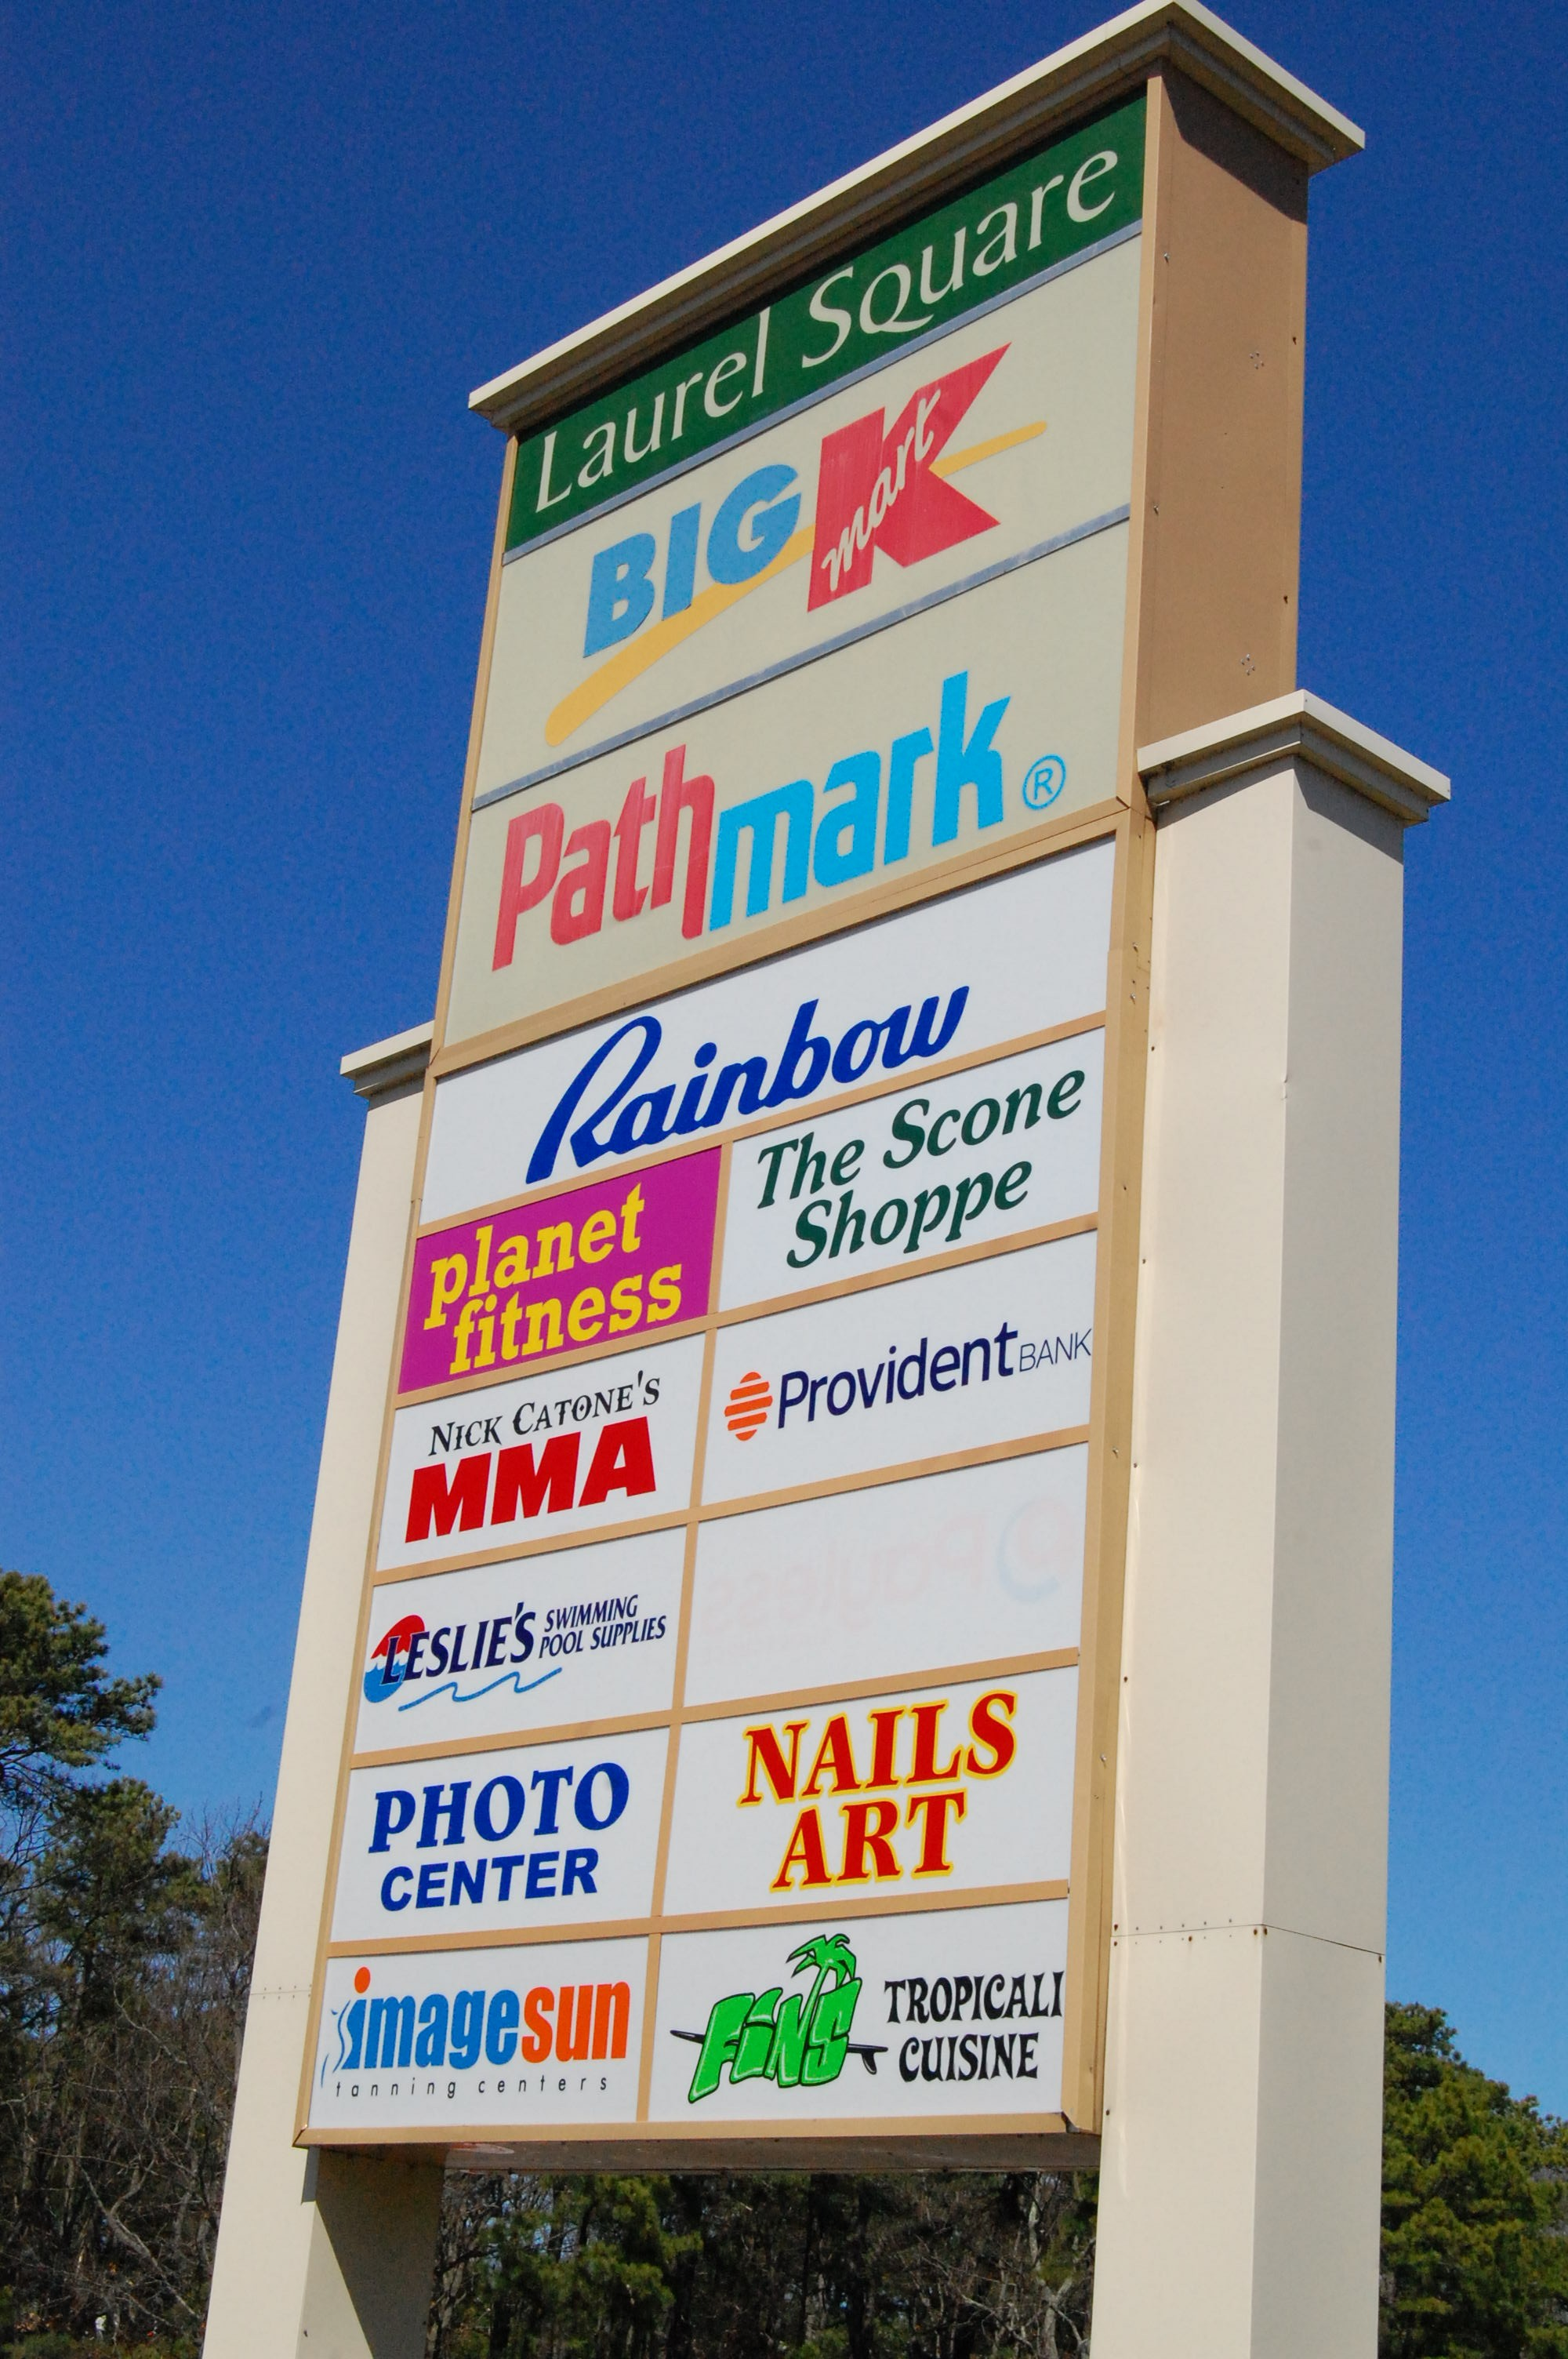 The Laurel Square shopping center, Brick, N.J. (Photo: Daniel Nee)